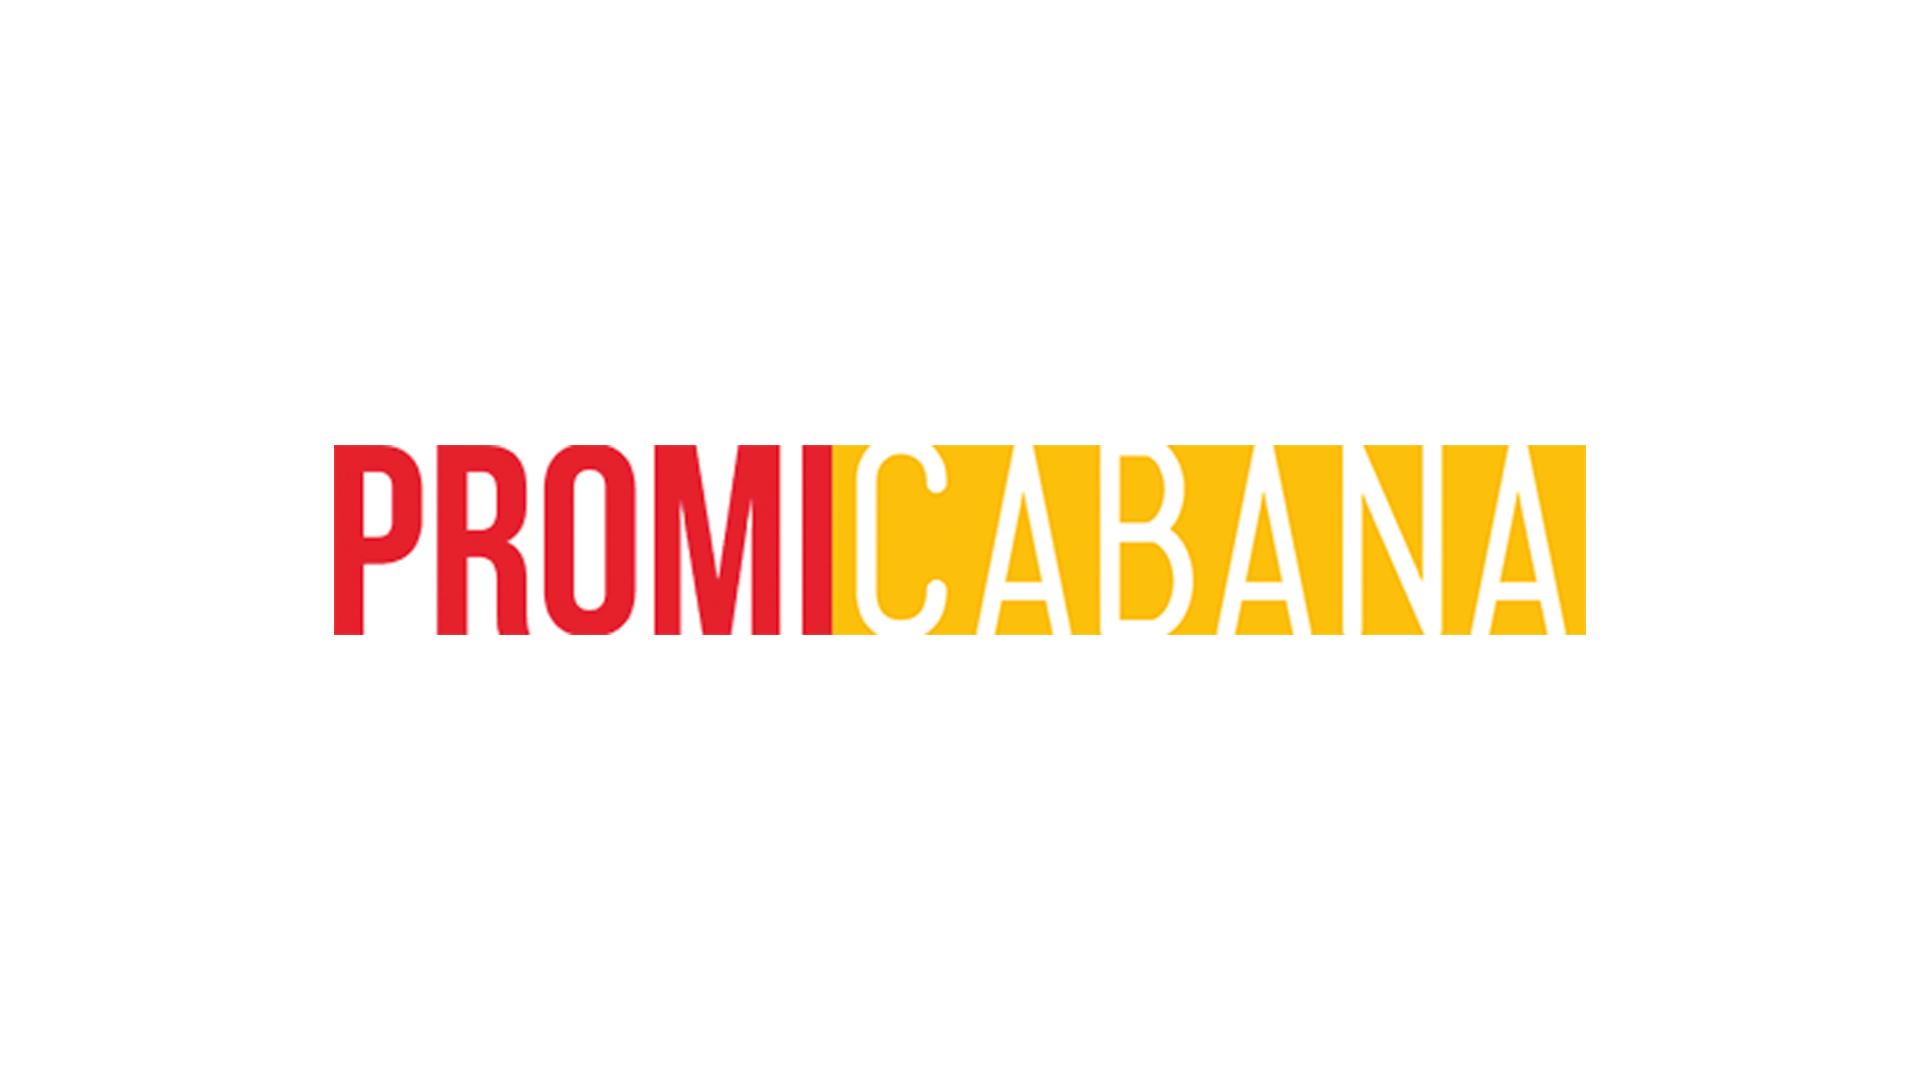 Matthew-McConaughey-Gold-Trailer-Hintern